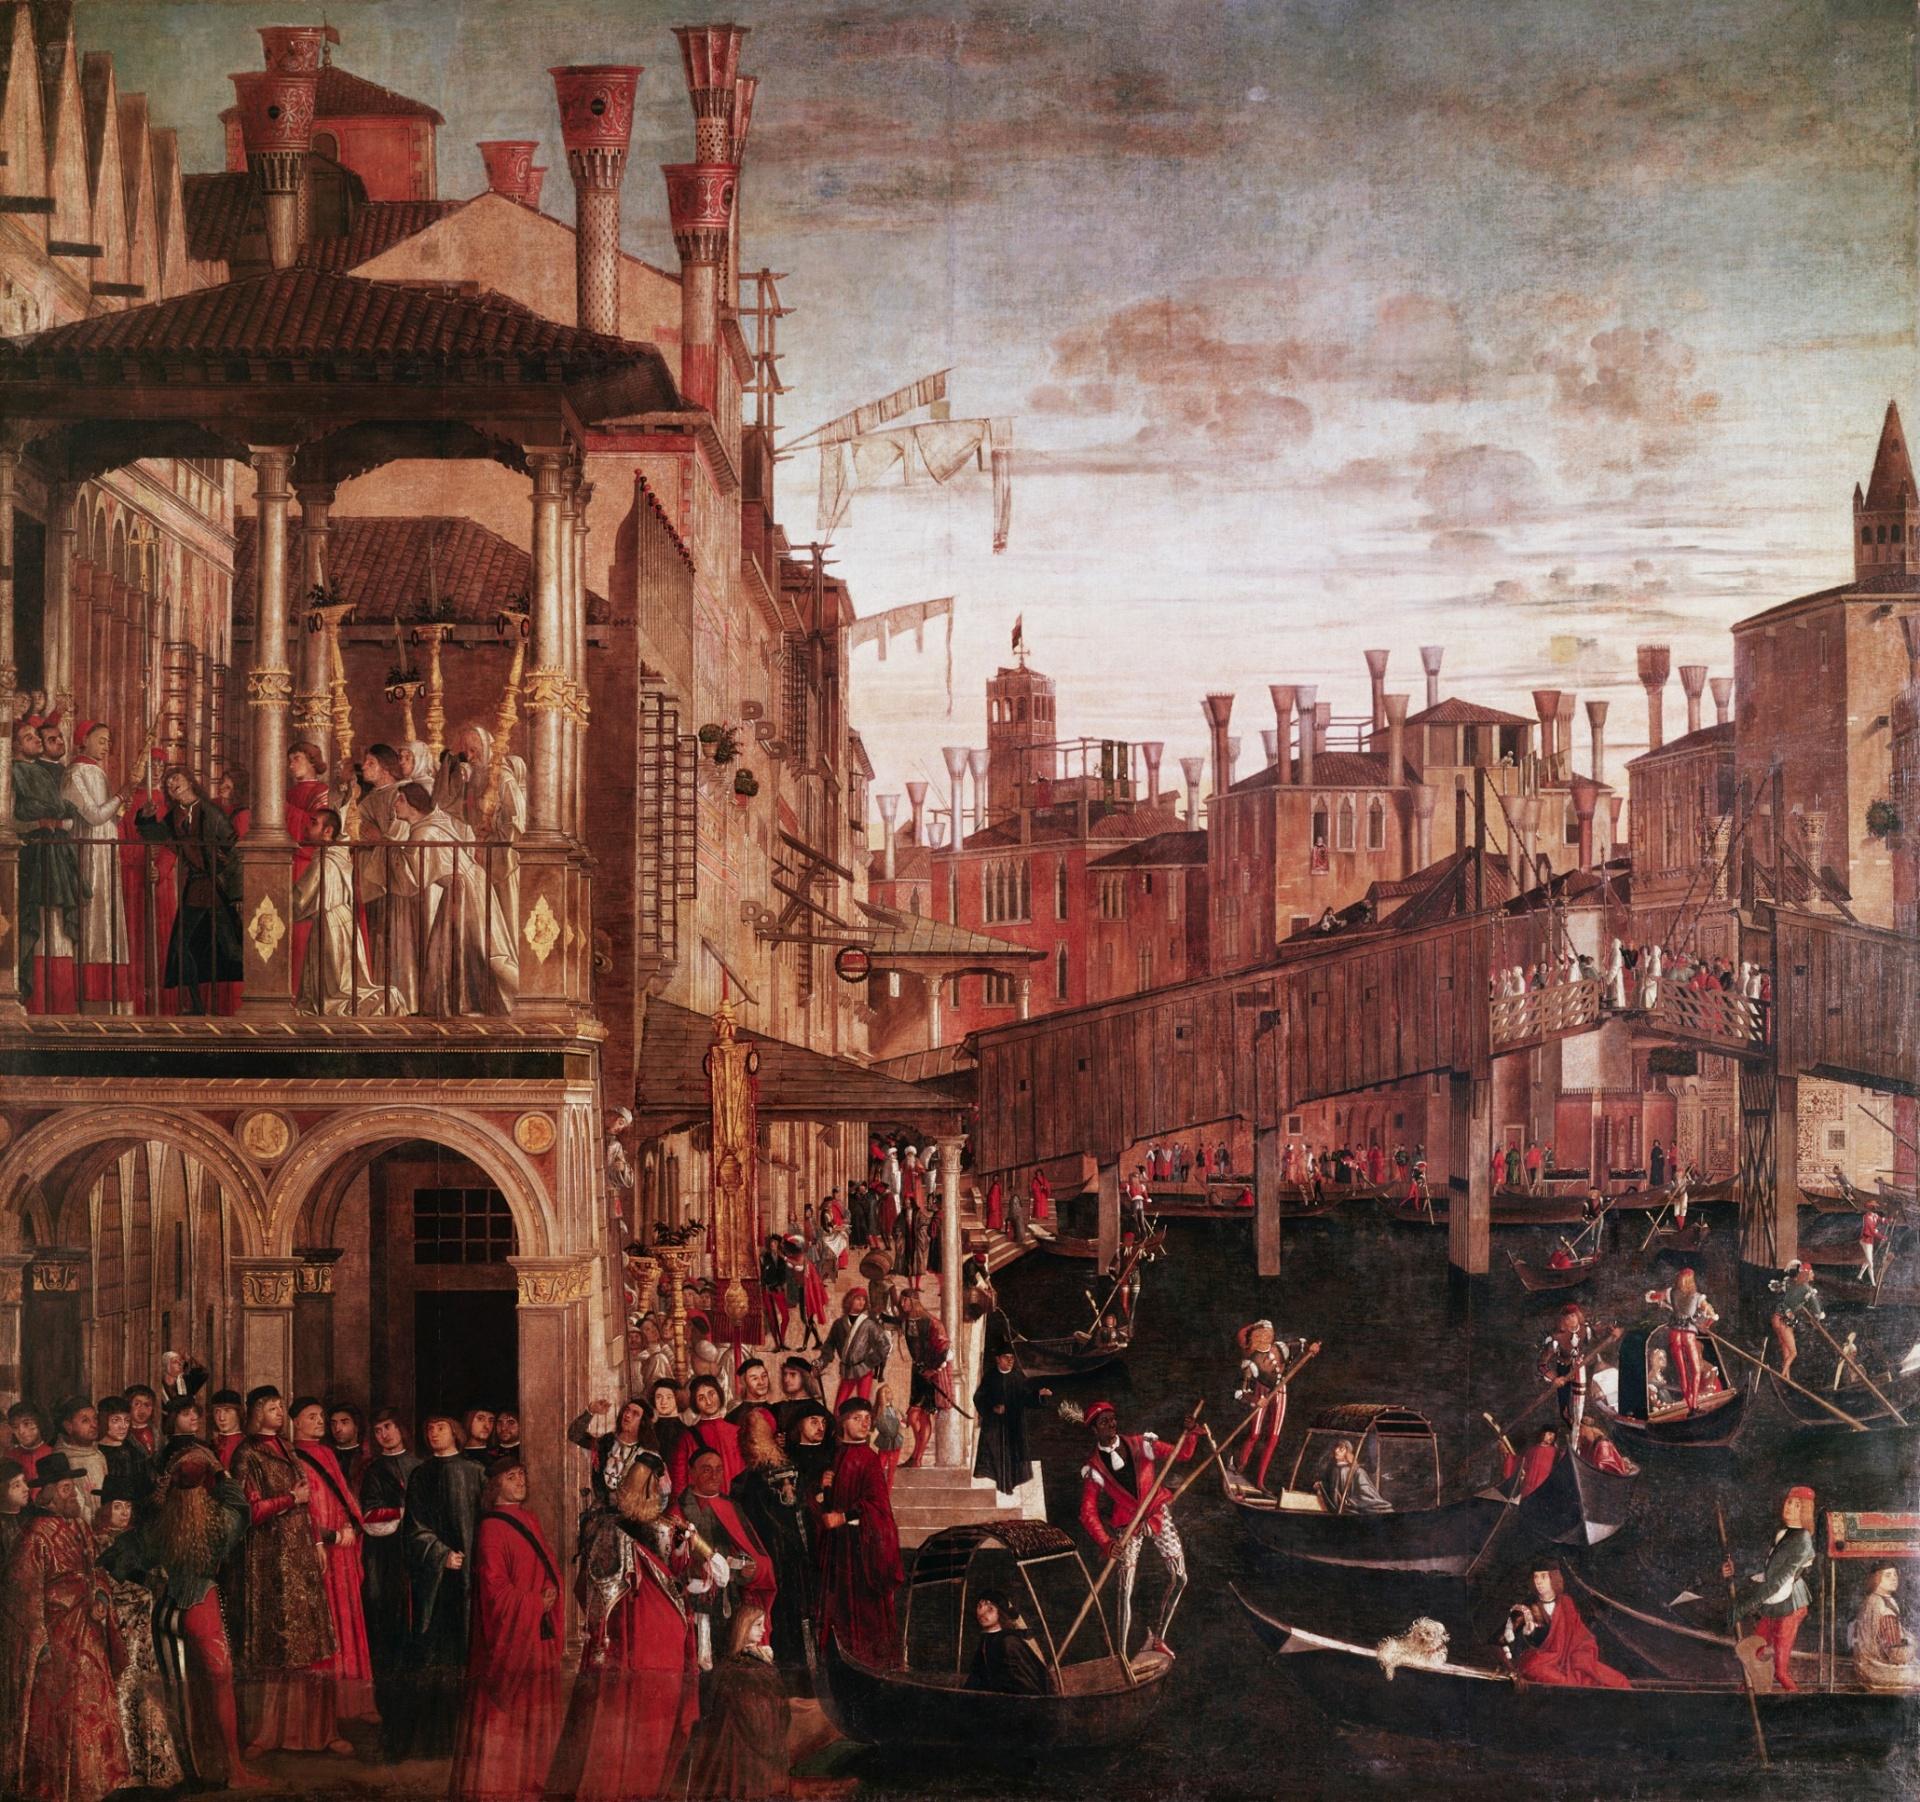 Vittore Carpaccio – The Healing of the Possessed Man at the Rialto (c. 1496)